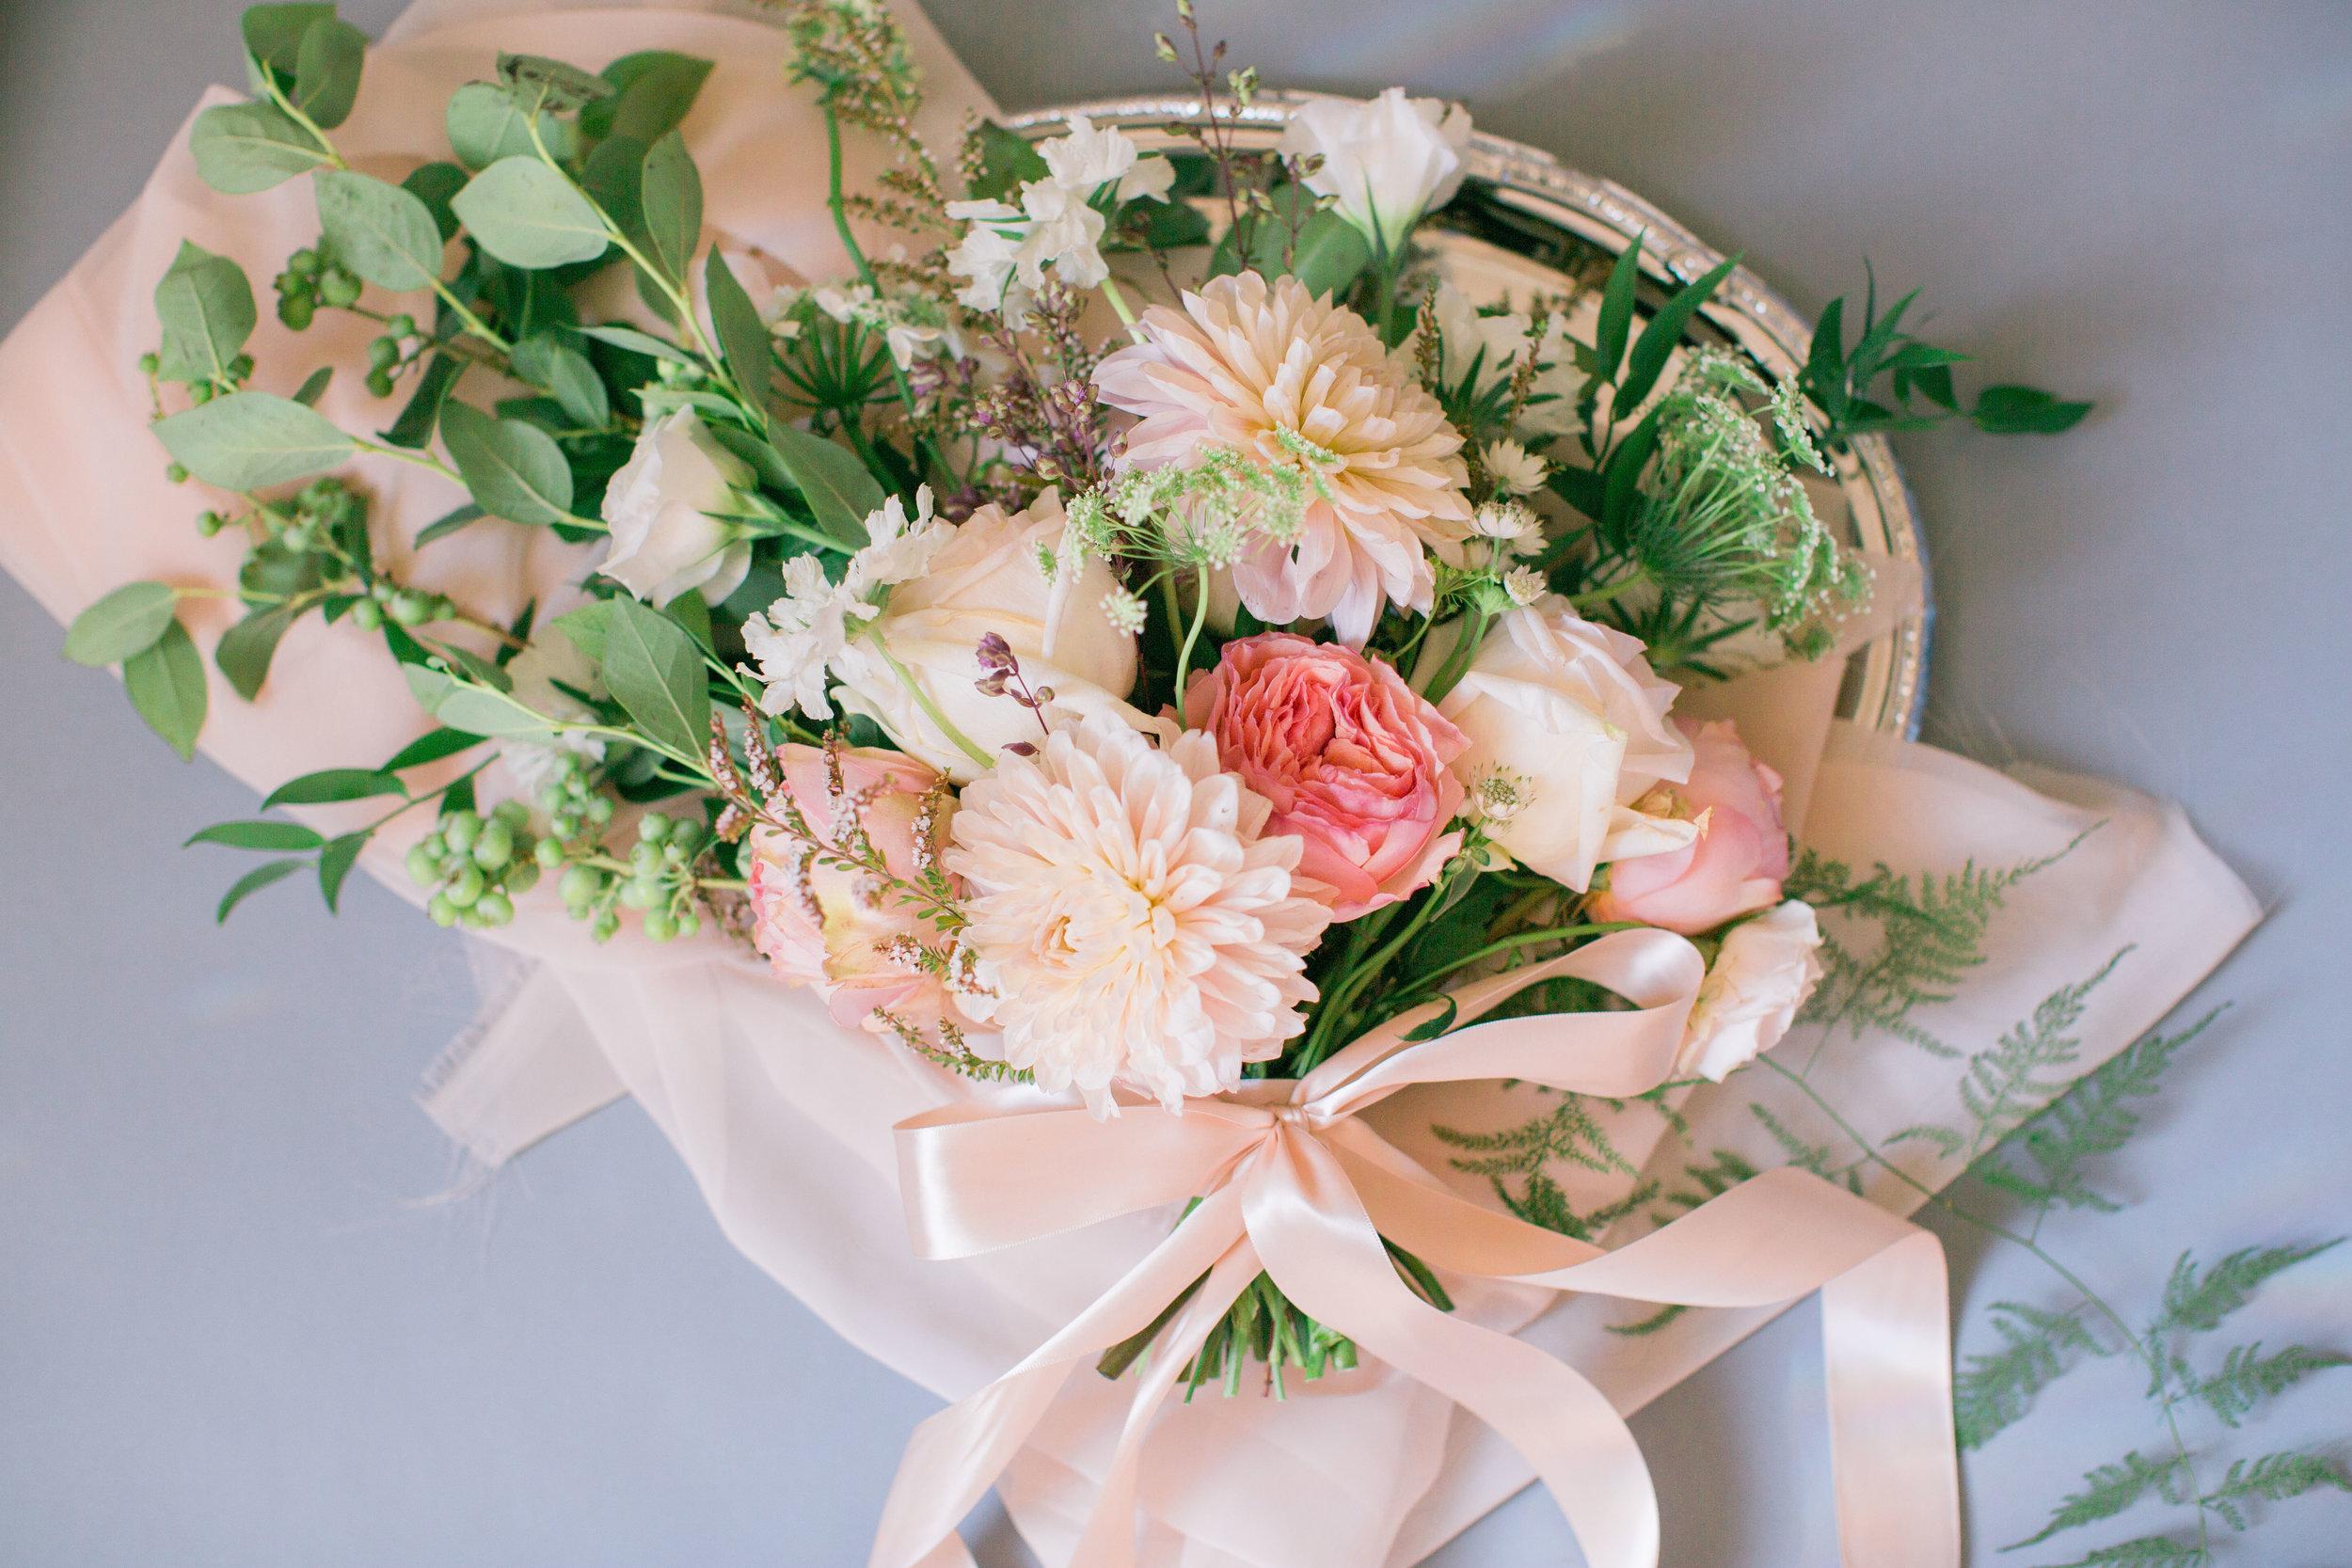 peach-bridal-bouquet-garden-style-bouquet-lovely-soiree-floral-designs-in-houston-texas